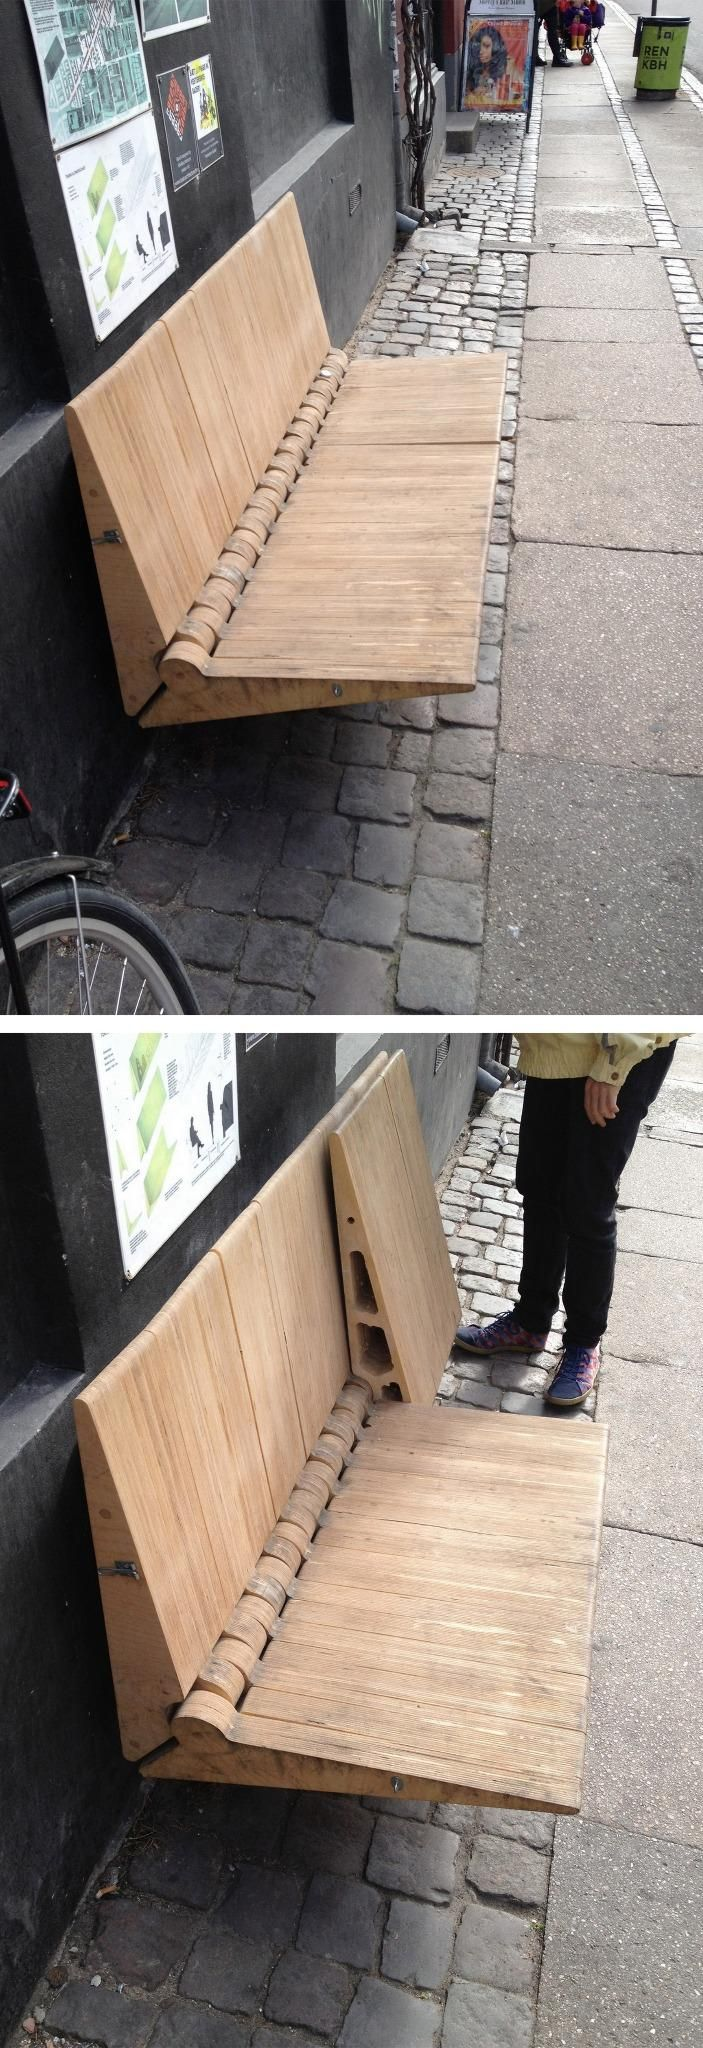 Bancas Públicas Plegables. Dinamarca/Copenhague